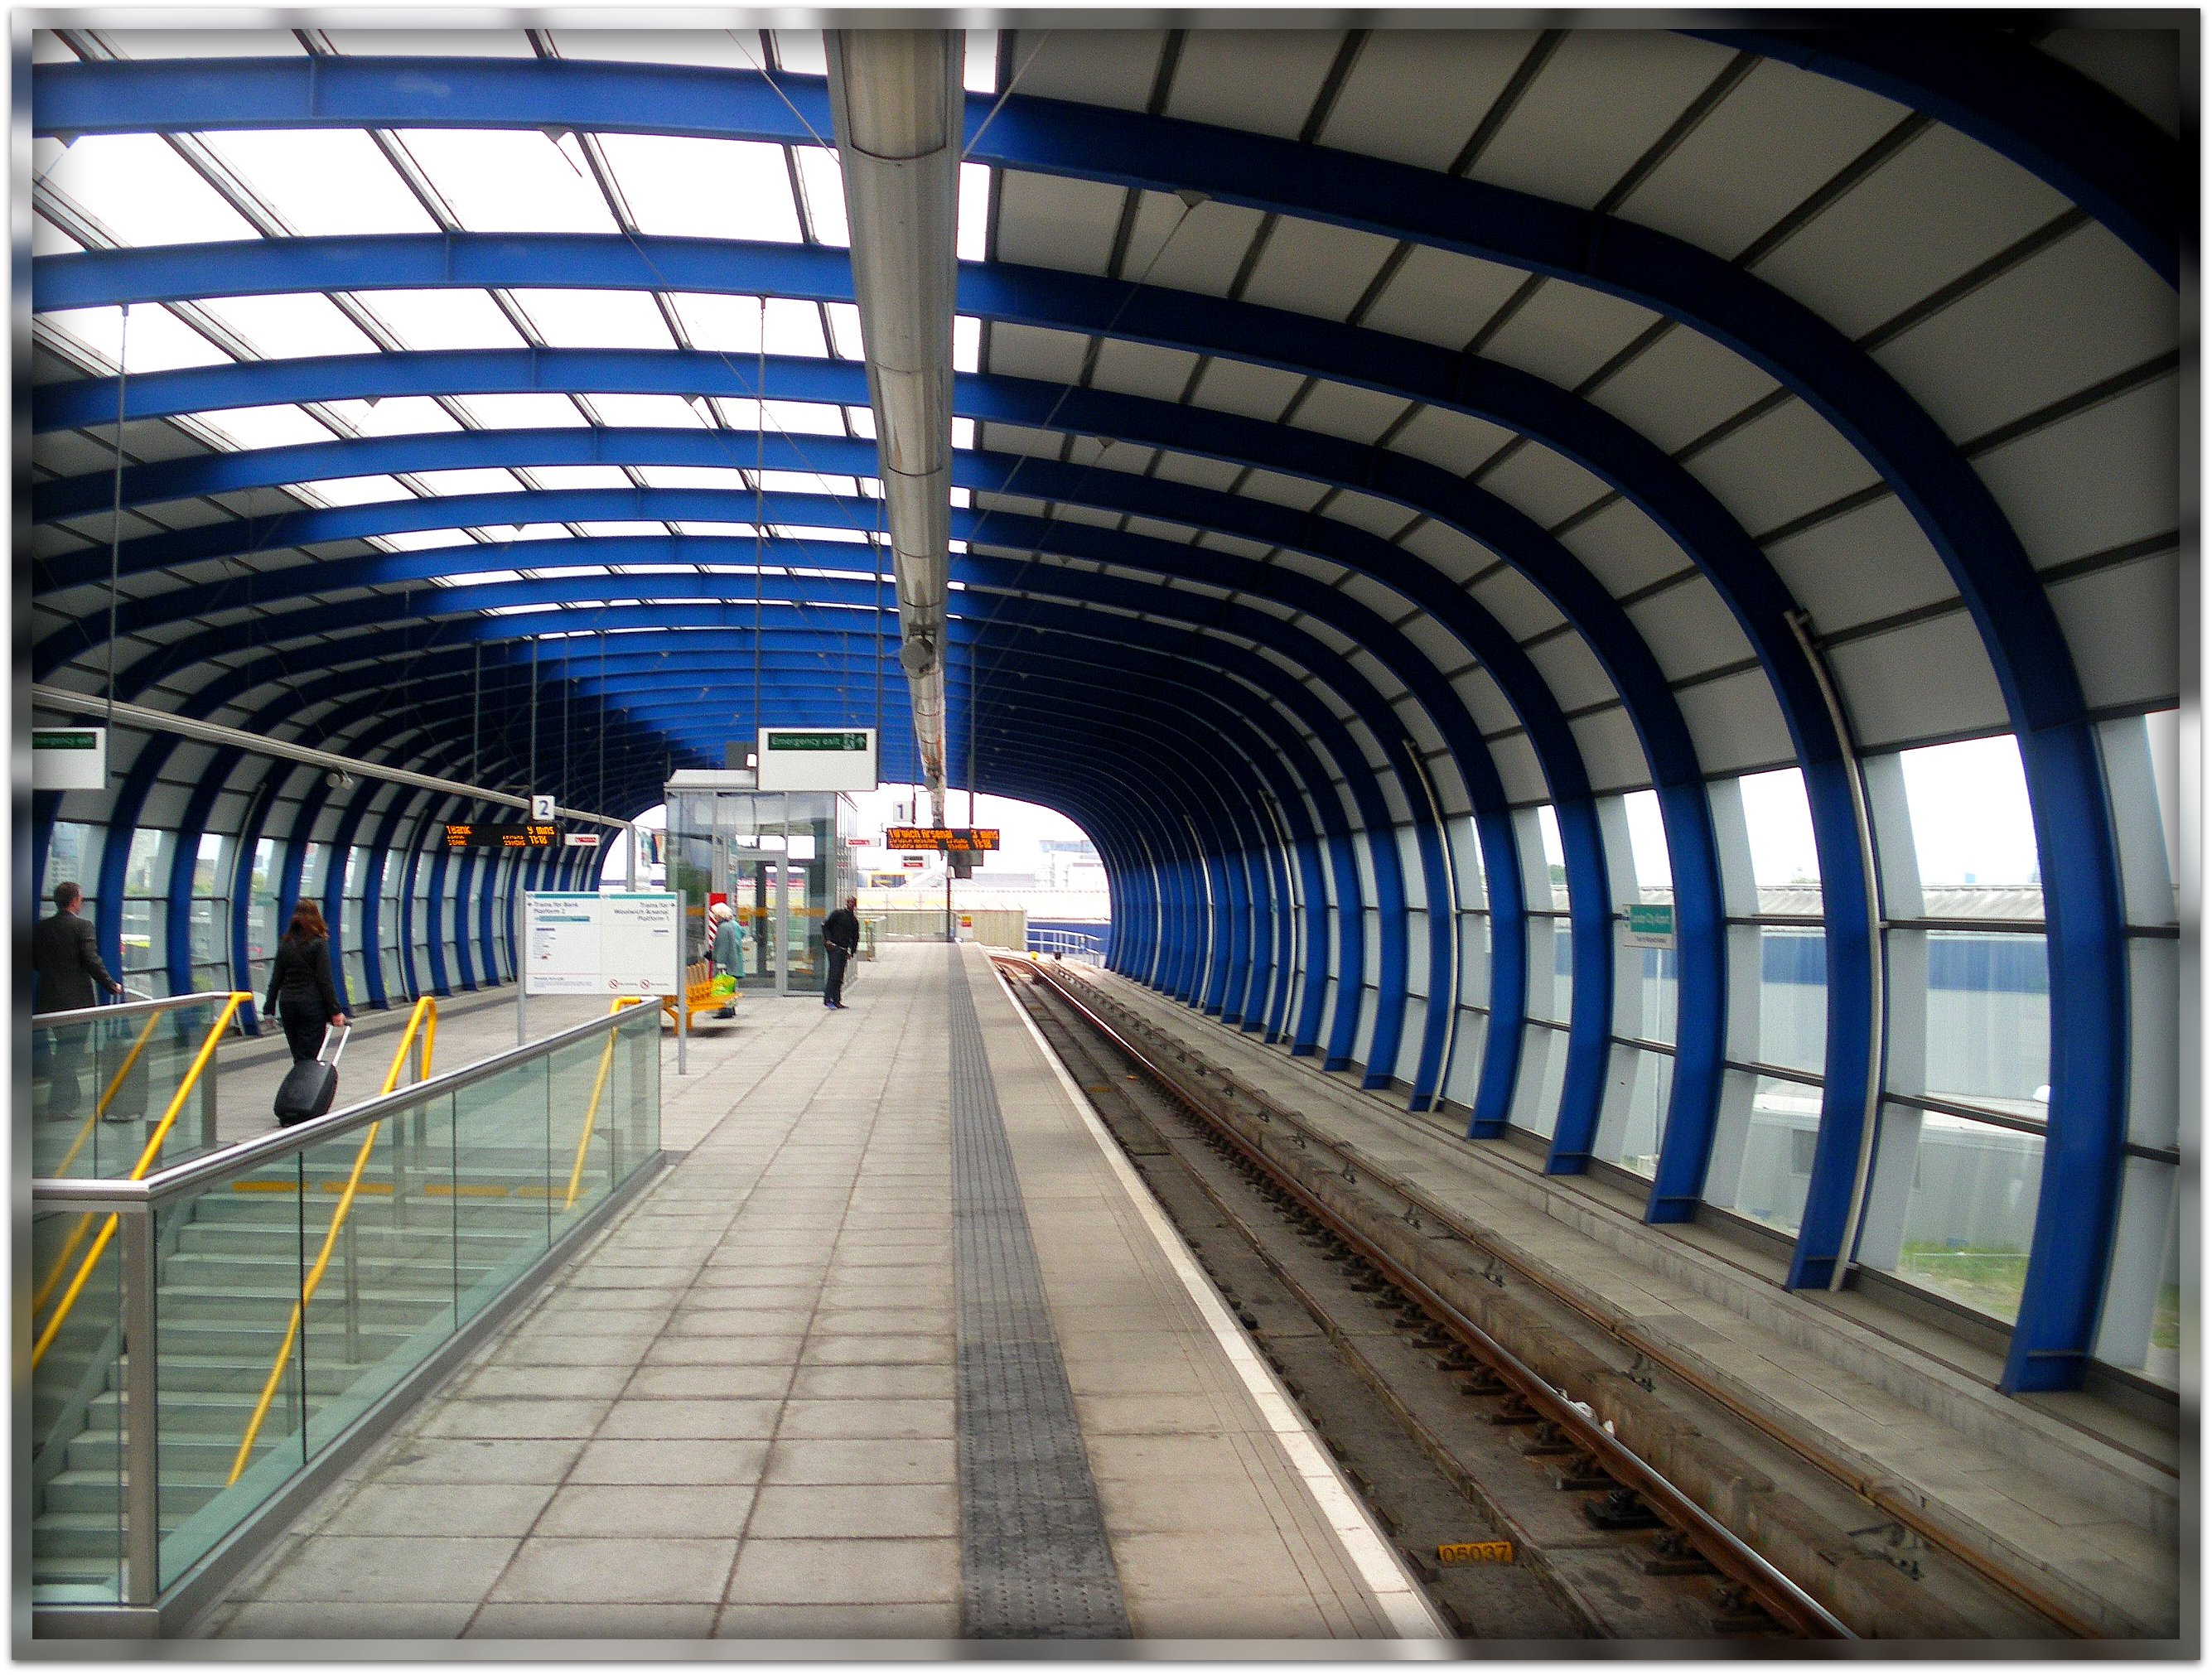 Dlr station photo